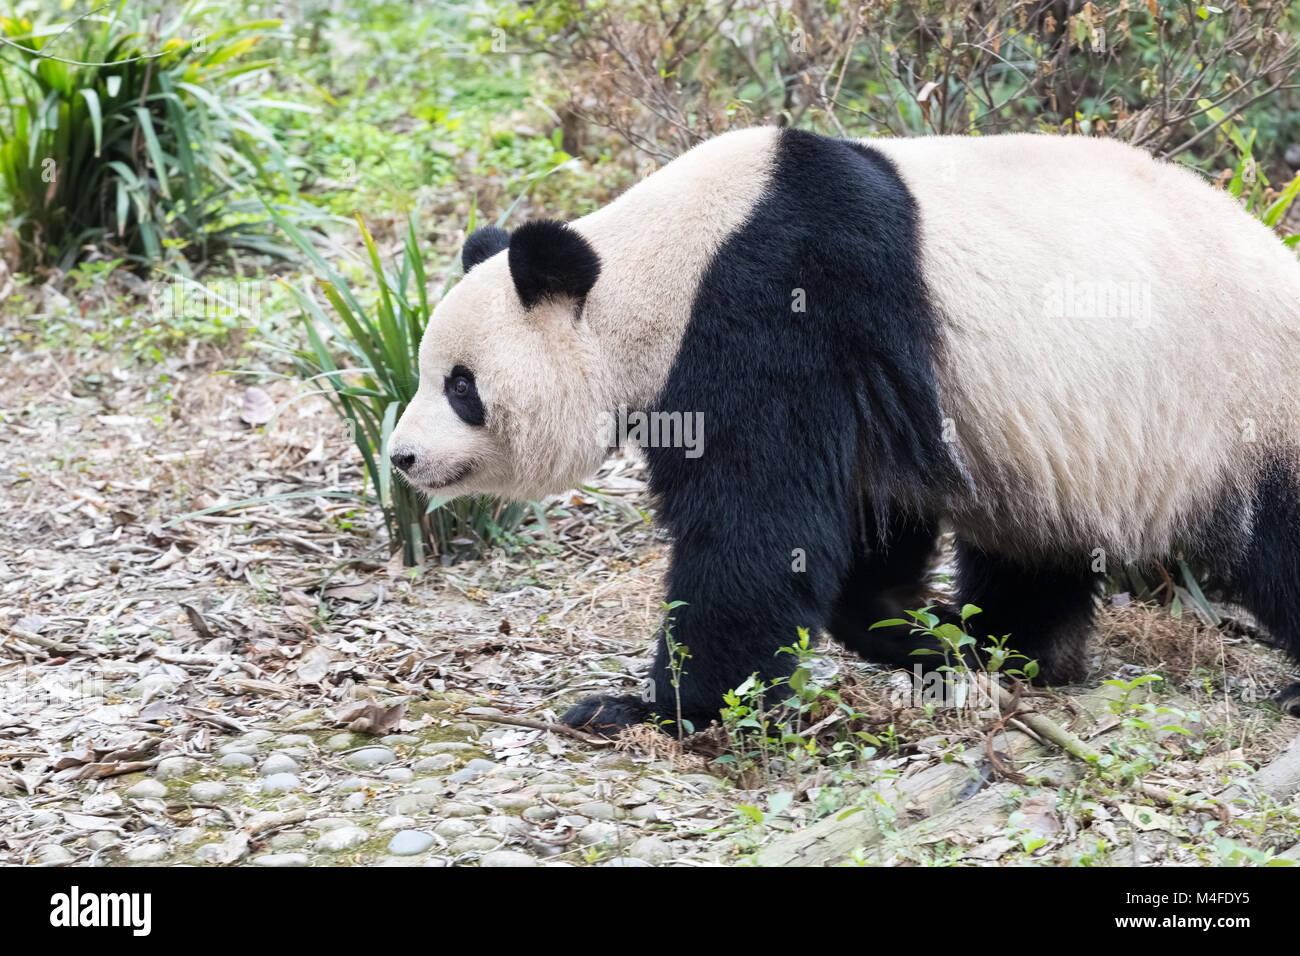 Panda géant libre Photo Stock